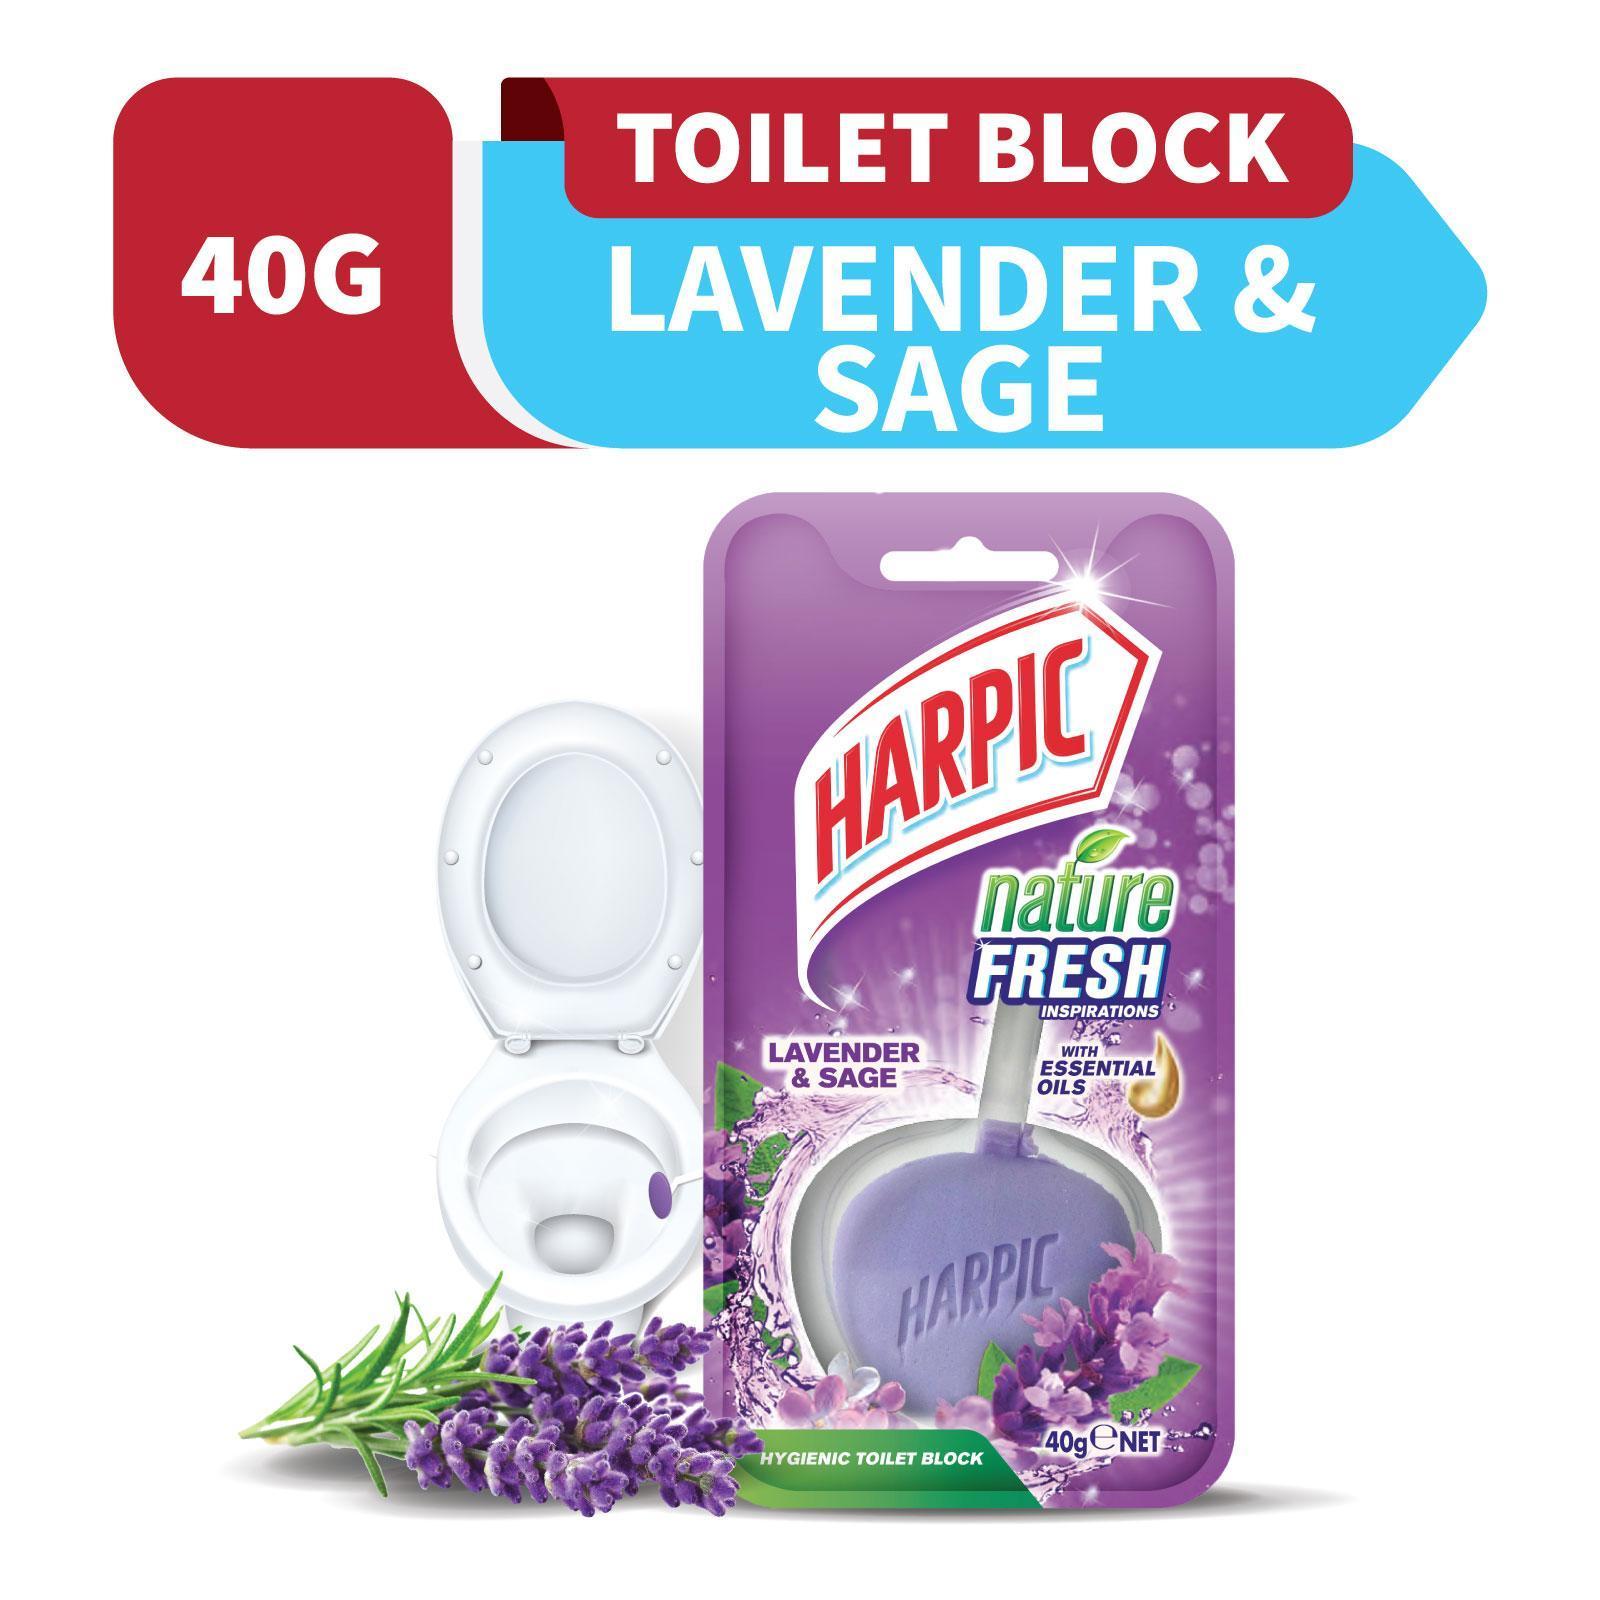 Harpic Hygienic Toilet Block Nature Fresh Lavender And Sage